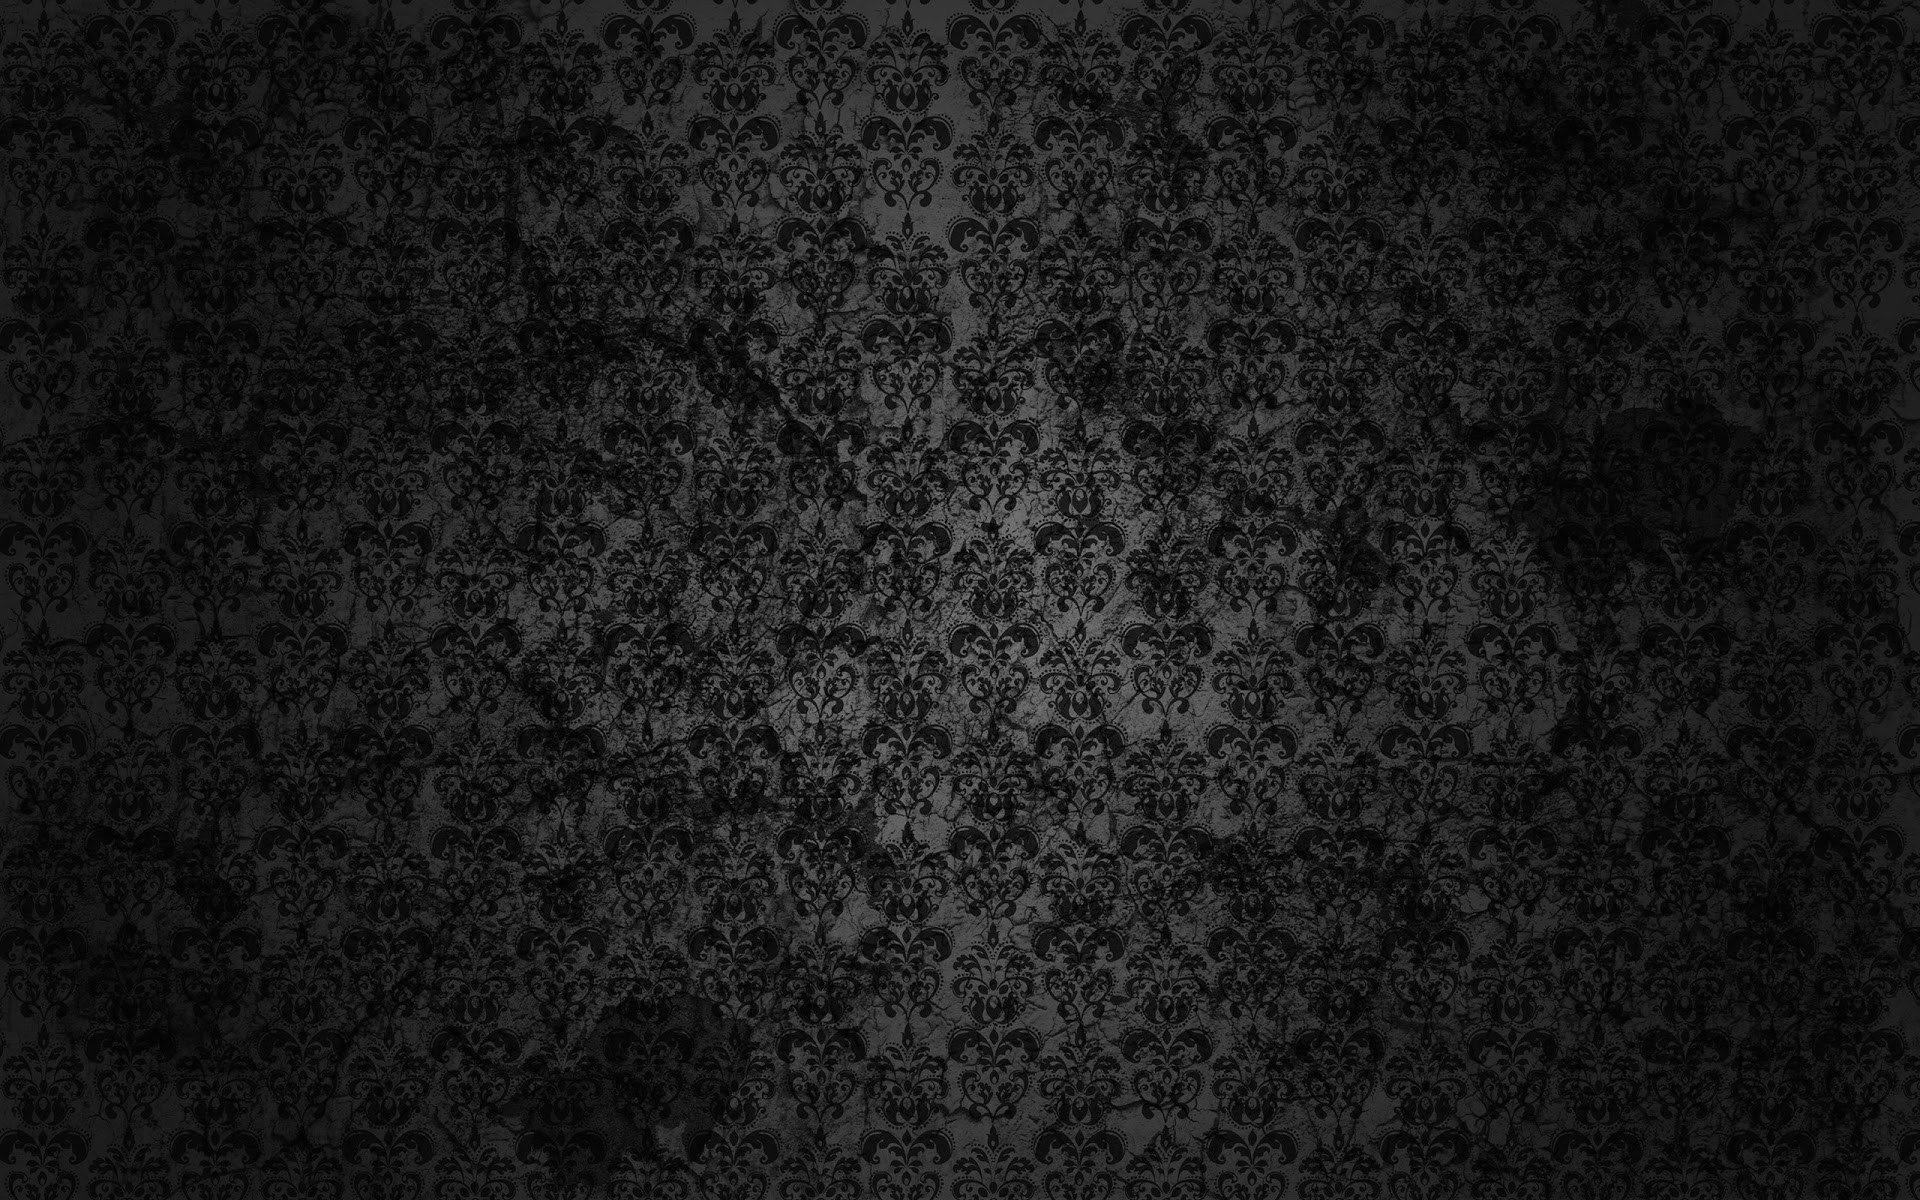 Black Floral Grunge Full HD Desktop Wallpapers 1080p 1920x1200